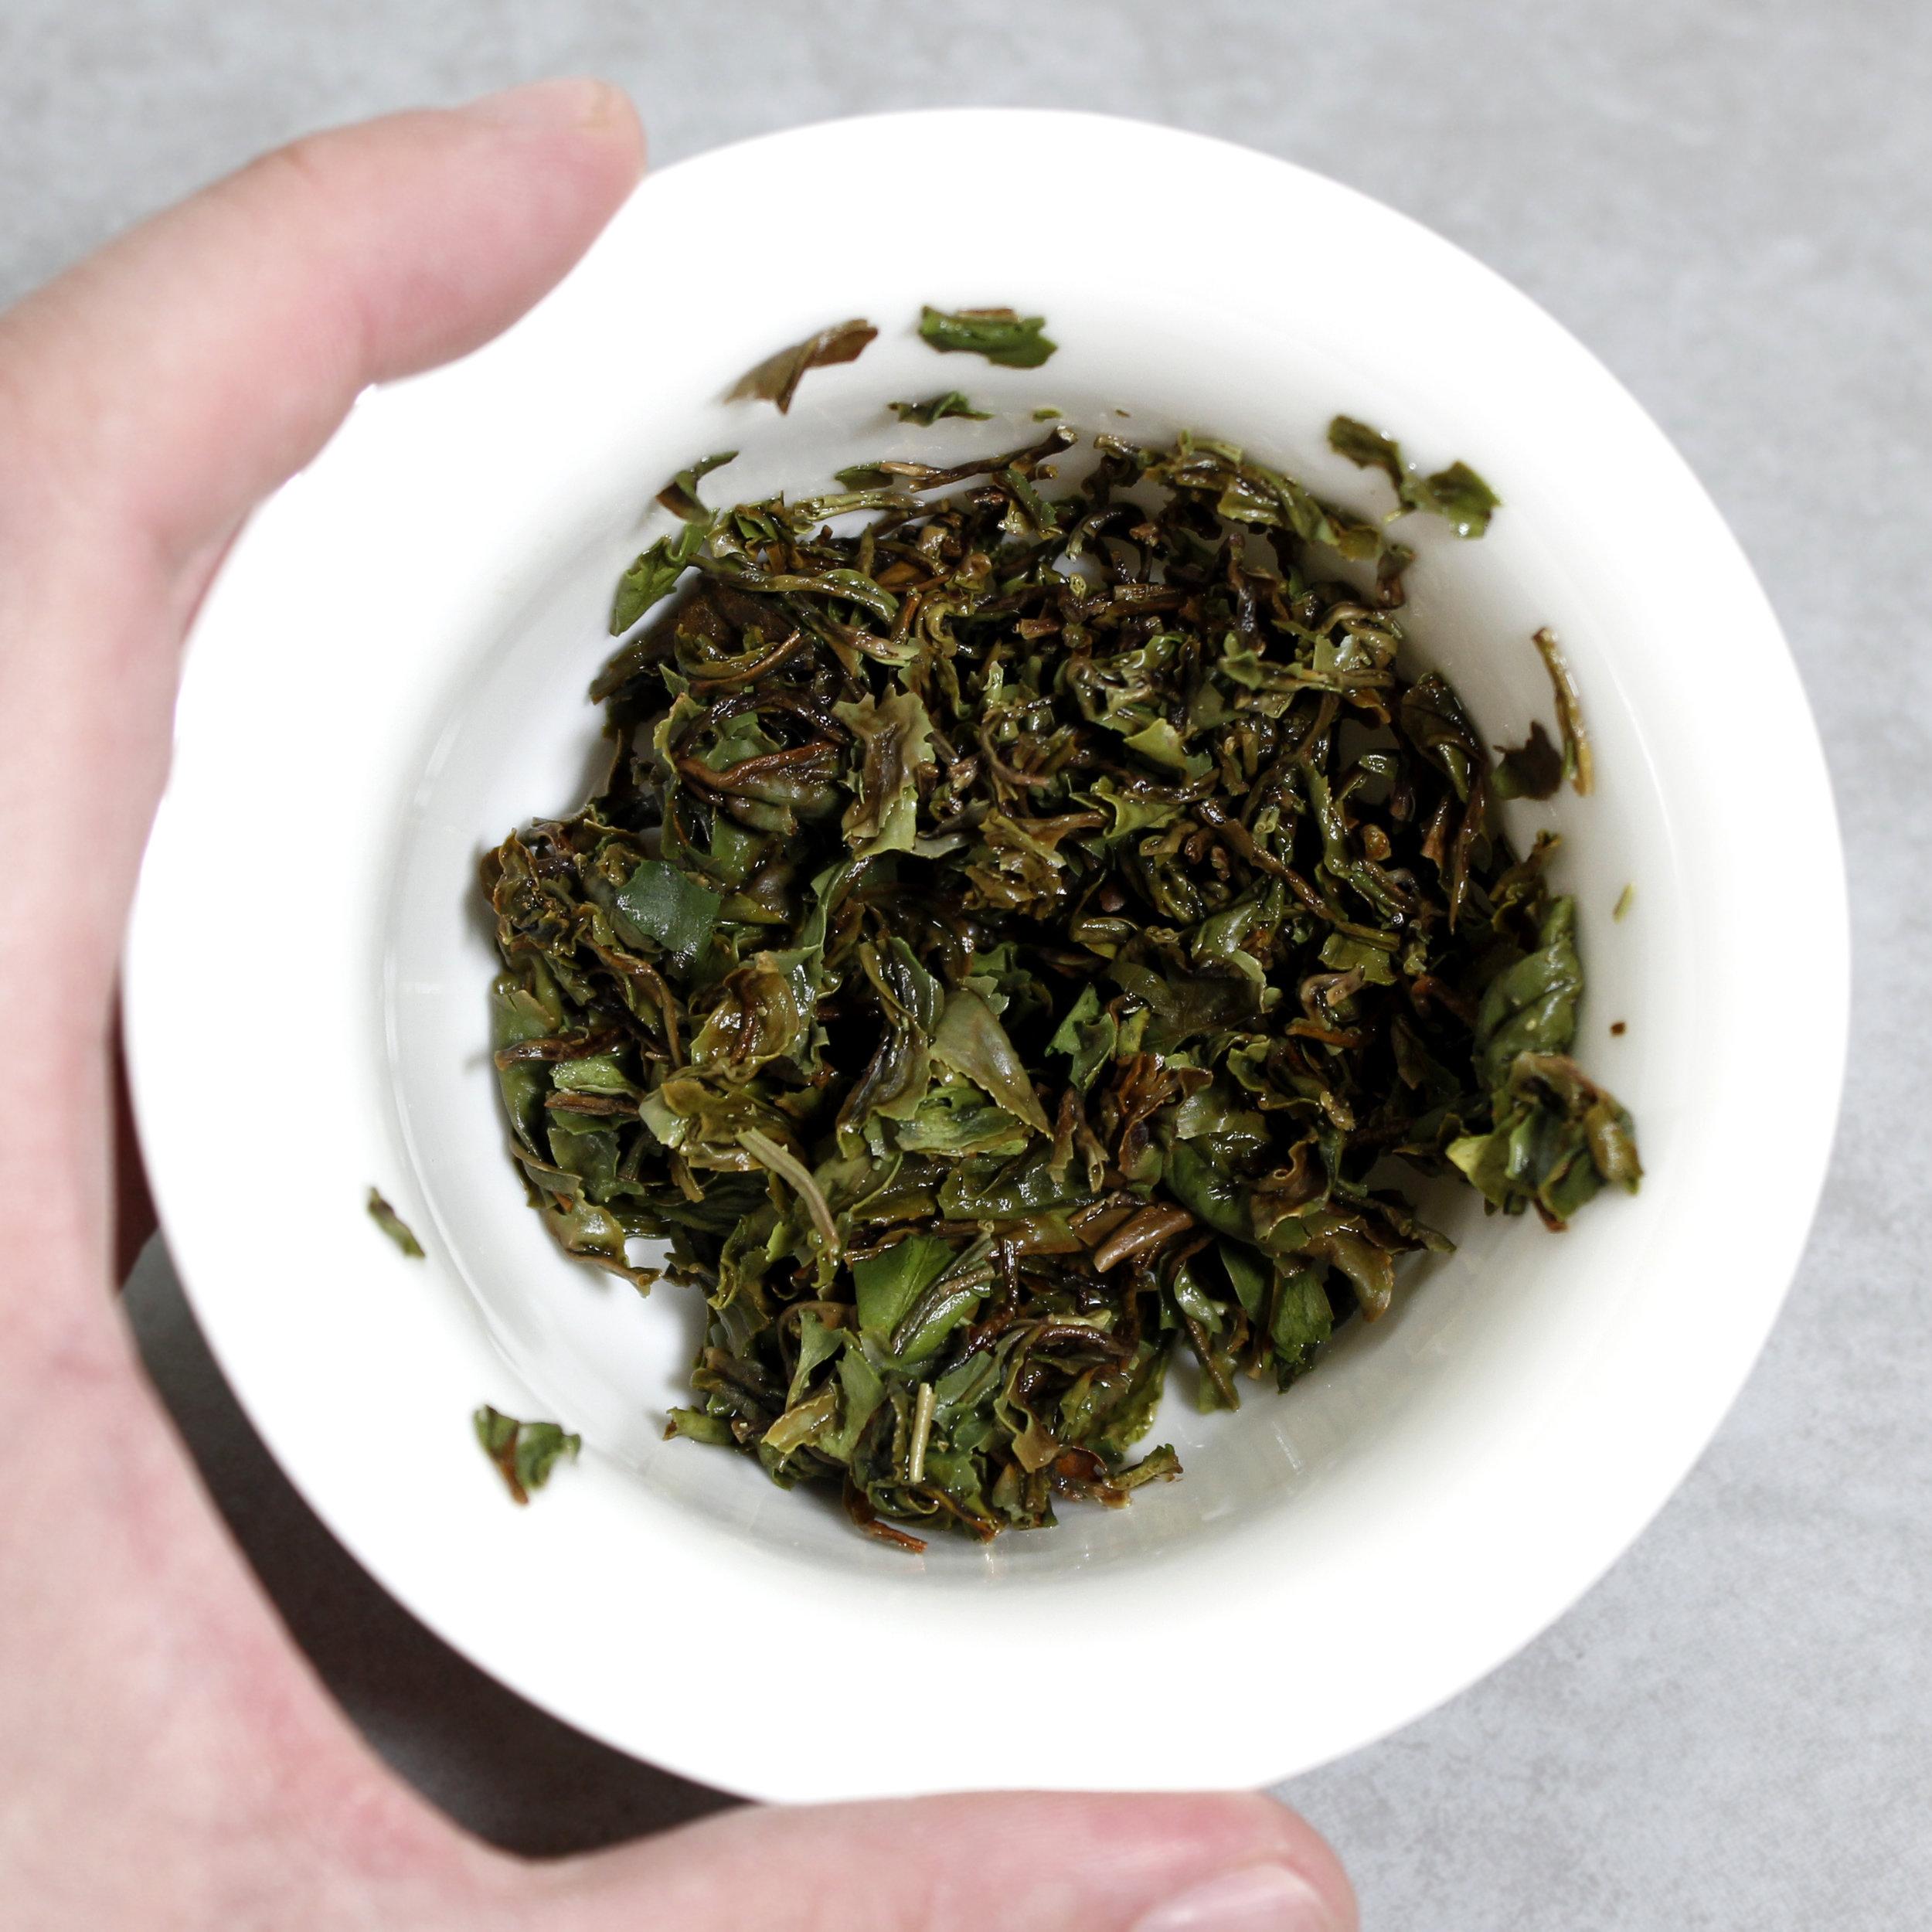 darjeeling-1st-flush-jungpana-estate-wonder-muscatel-black-whole-leaf-tea-itw2.jpg